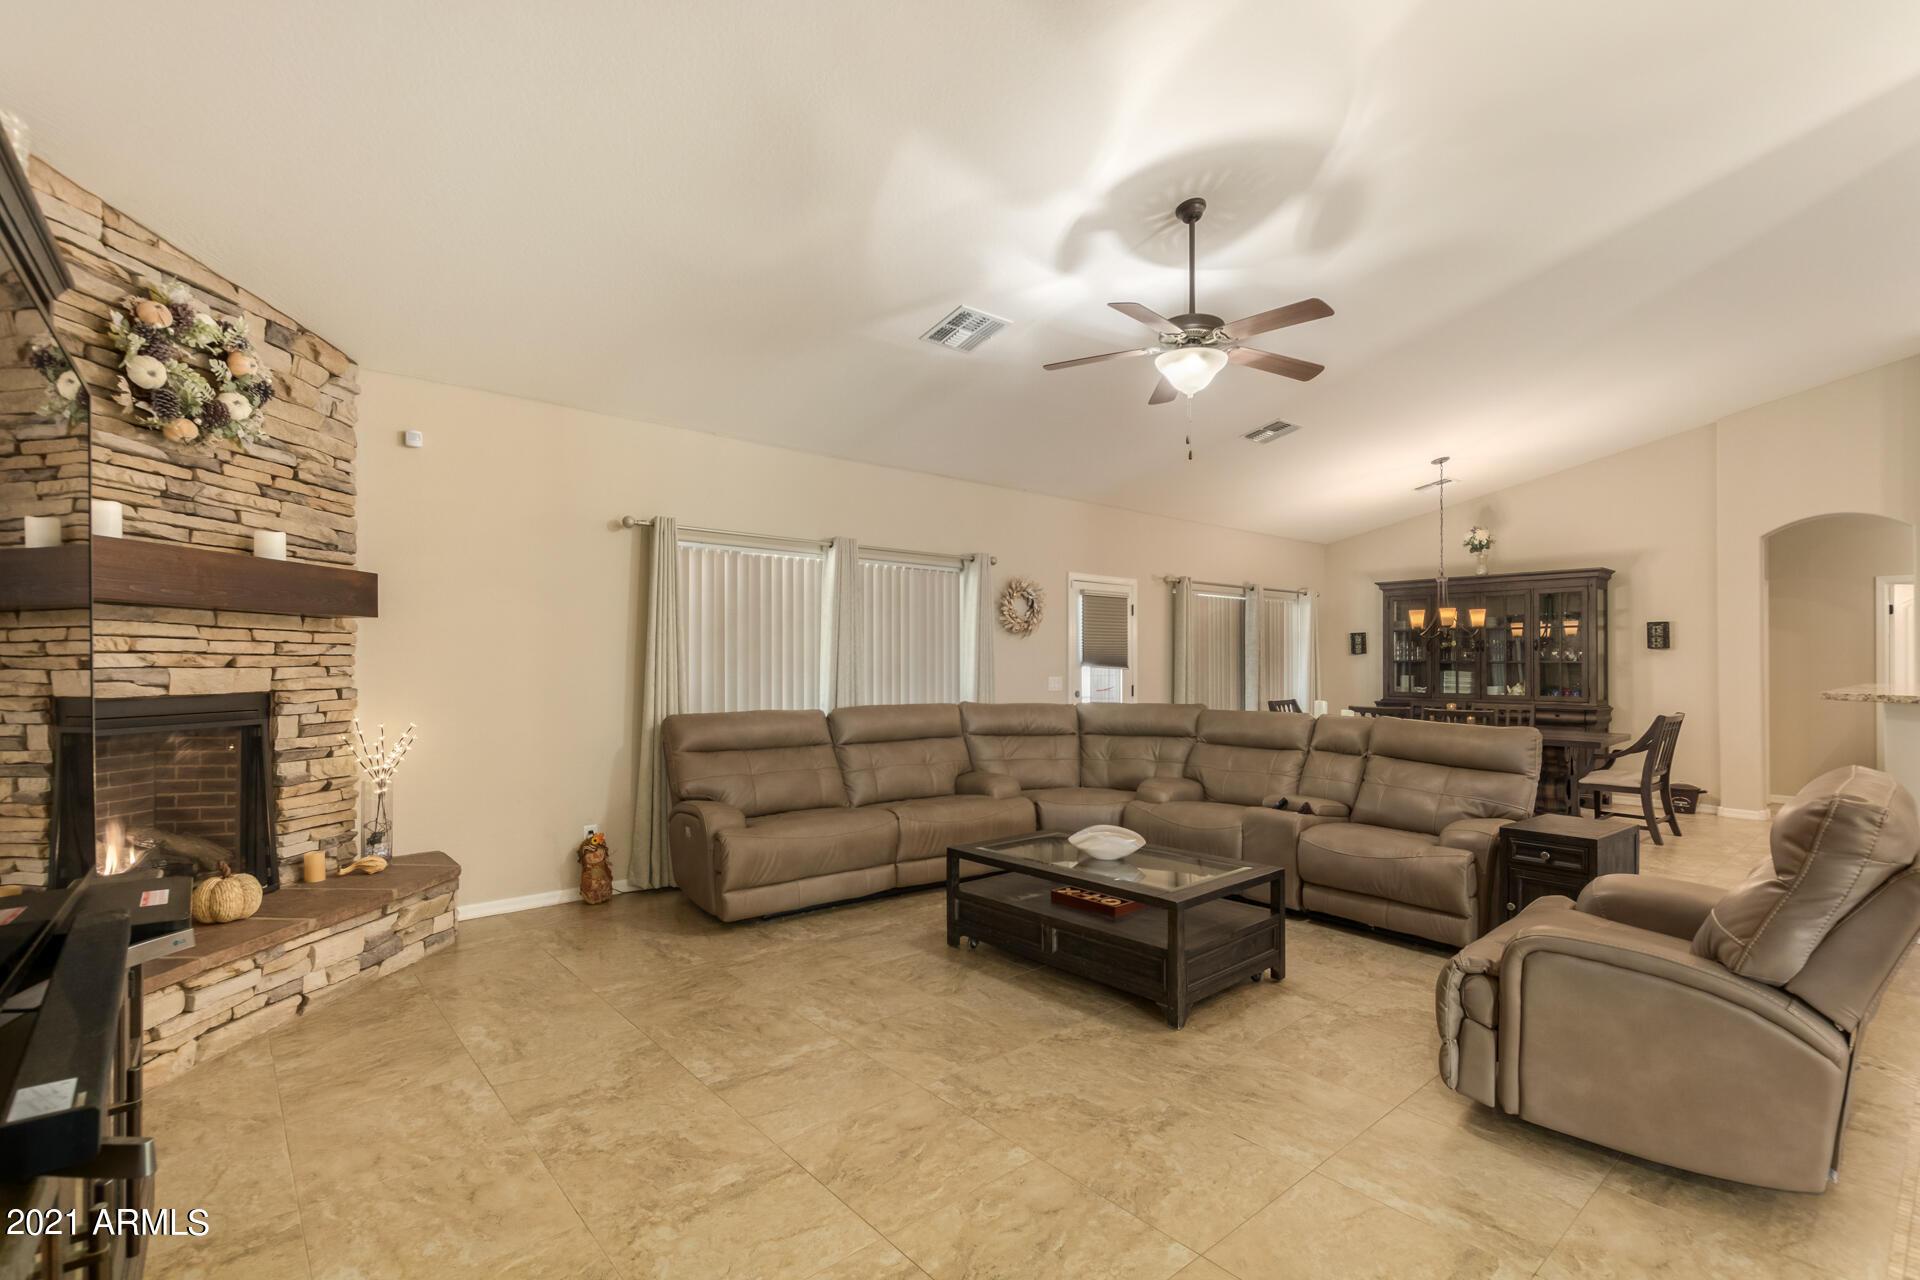 Scottsdale AZ 85263 Photo 3